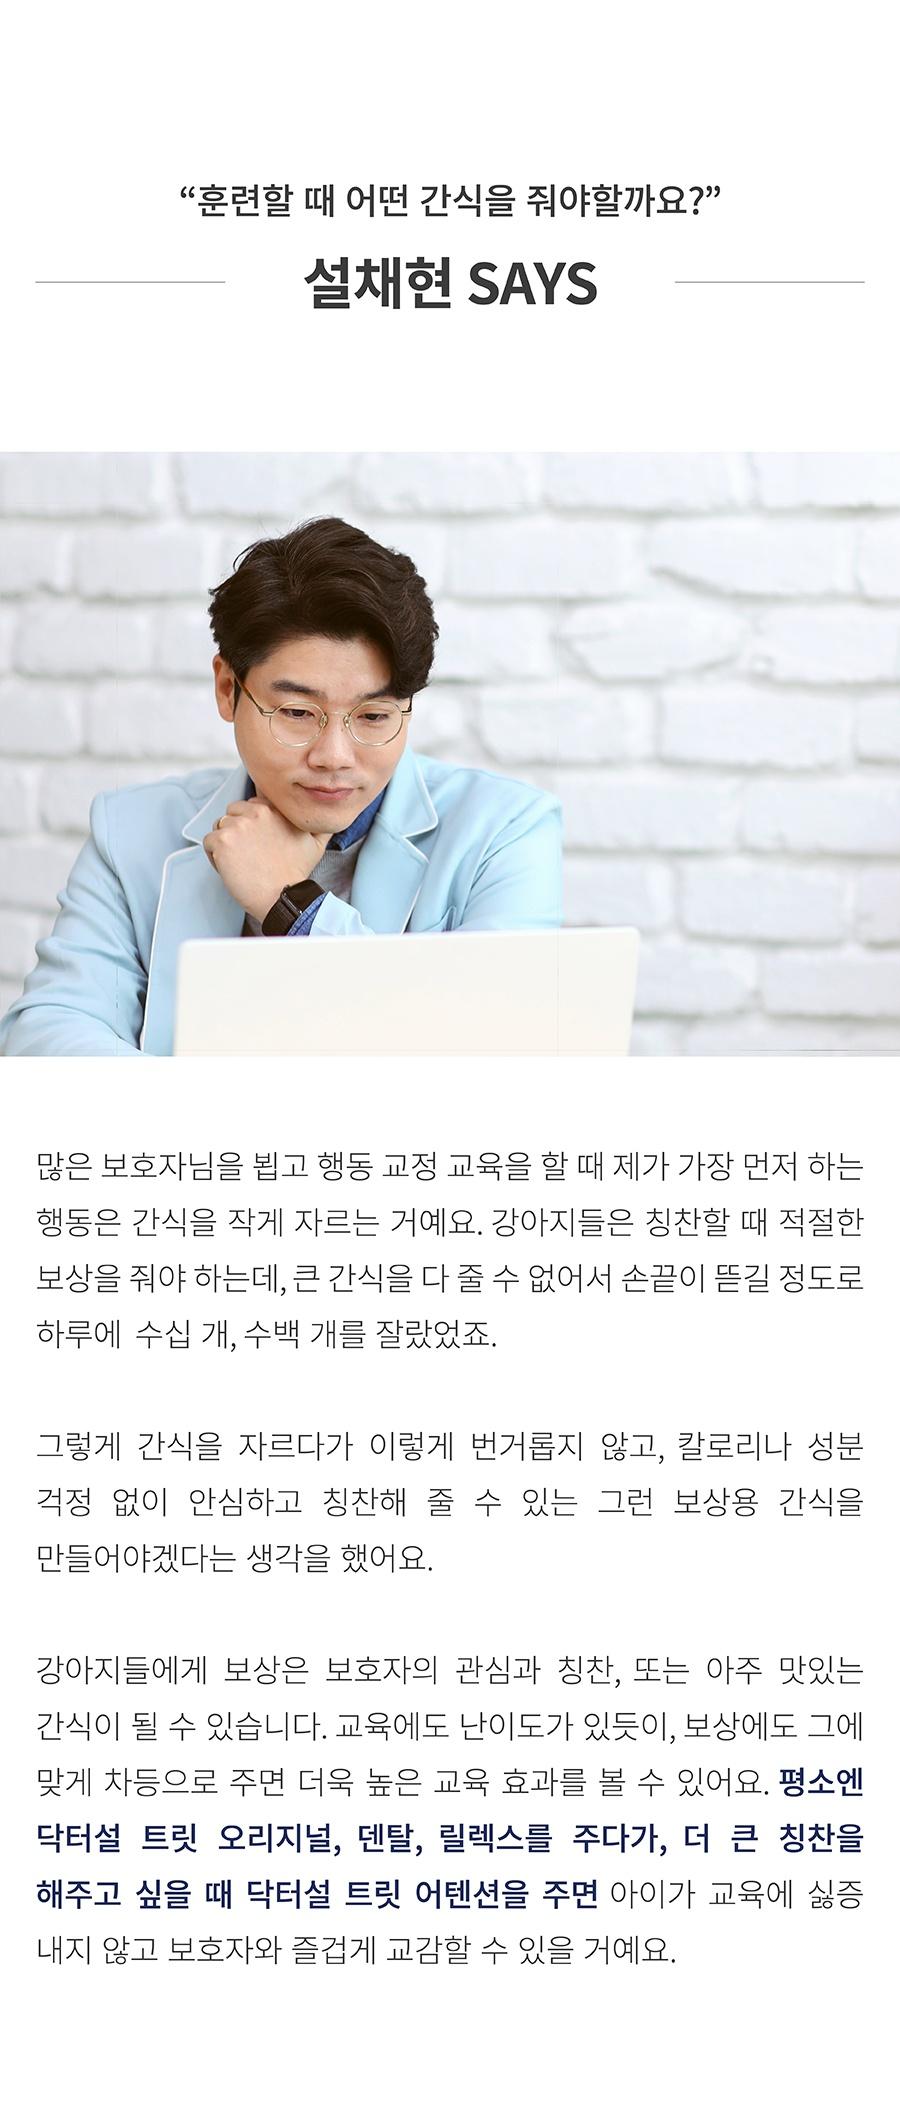 [EVENT] 닥터설 트릿-상품이미지-3